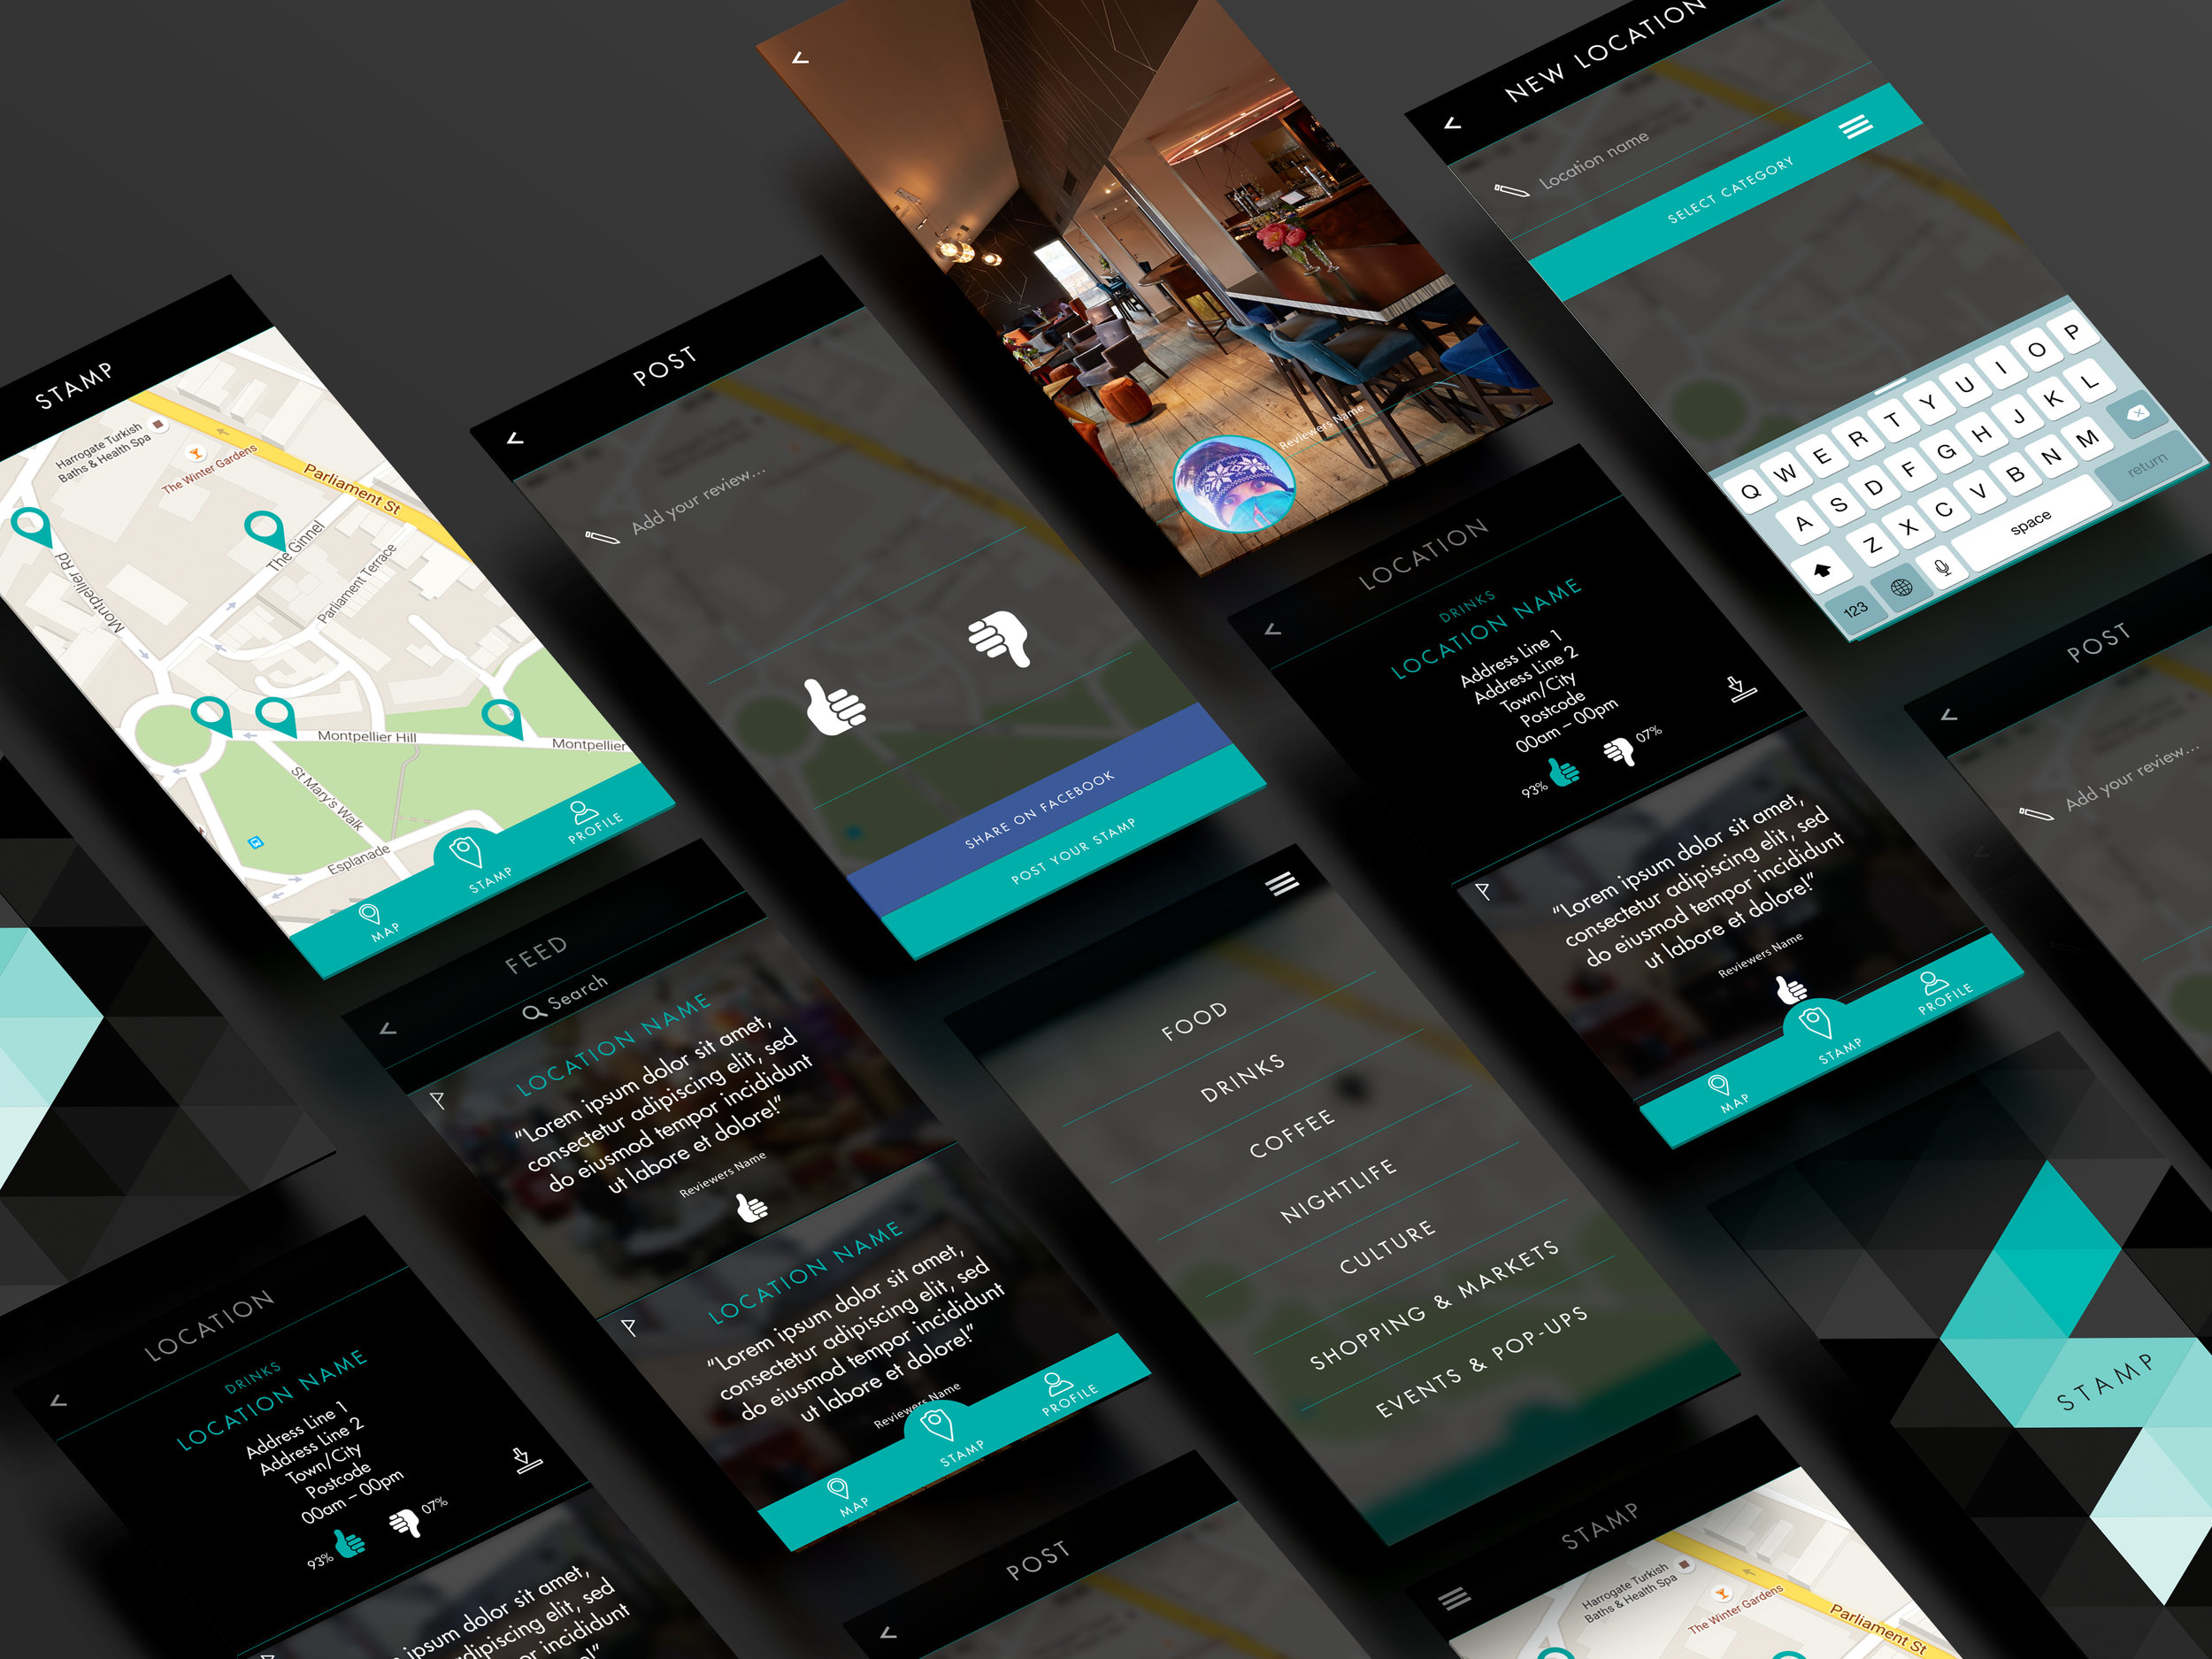 Perspective-App-Screens-Mock-Up-16.jpg